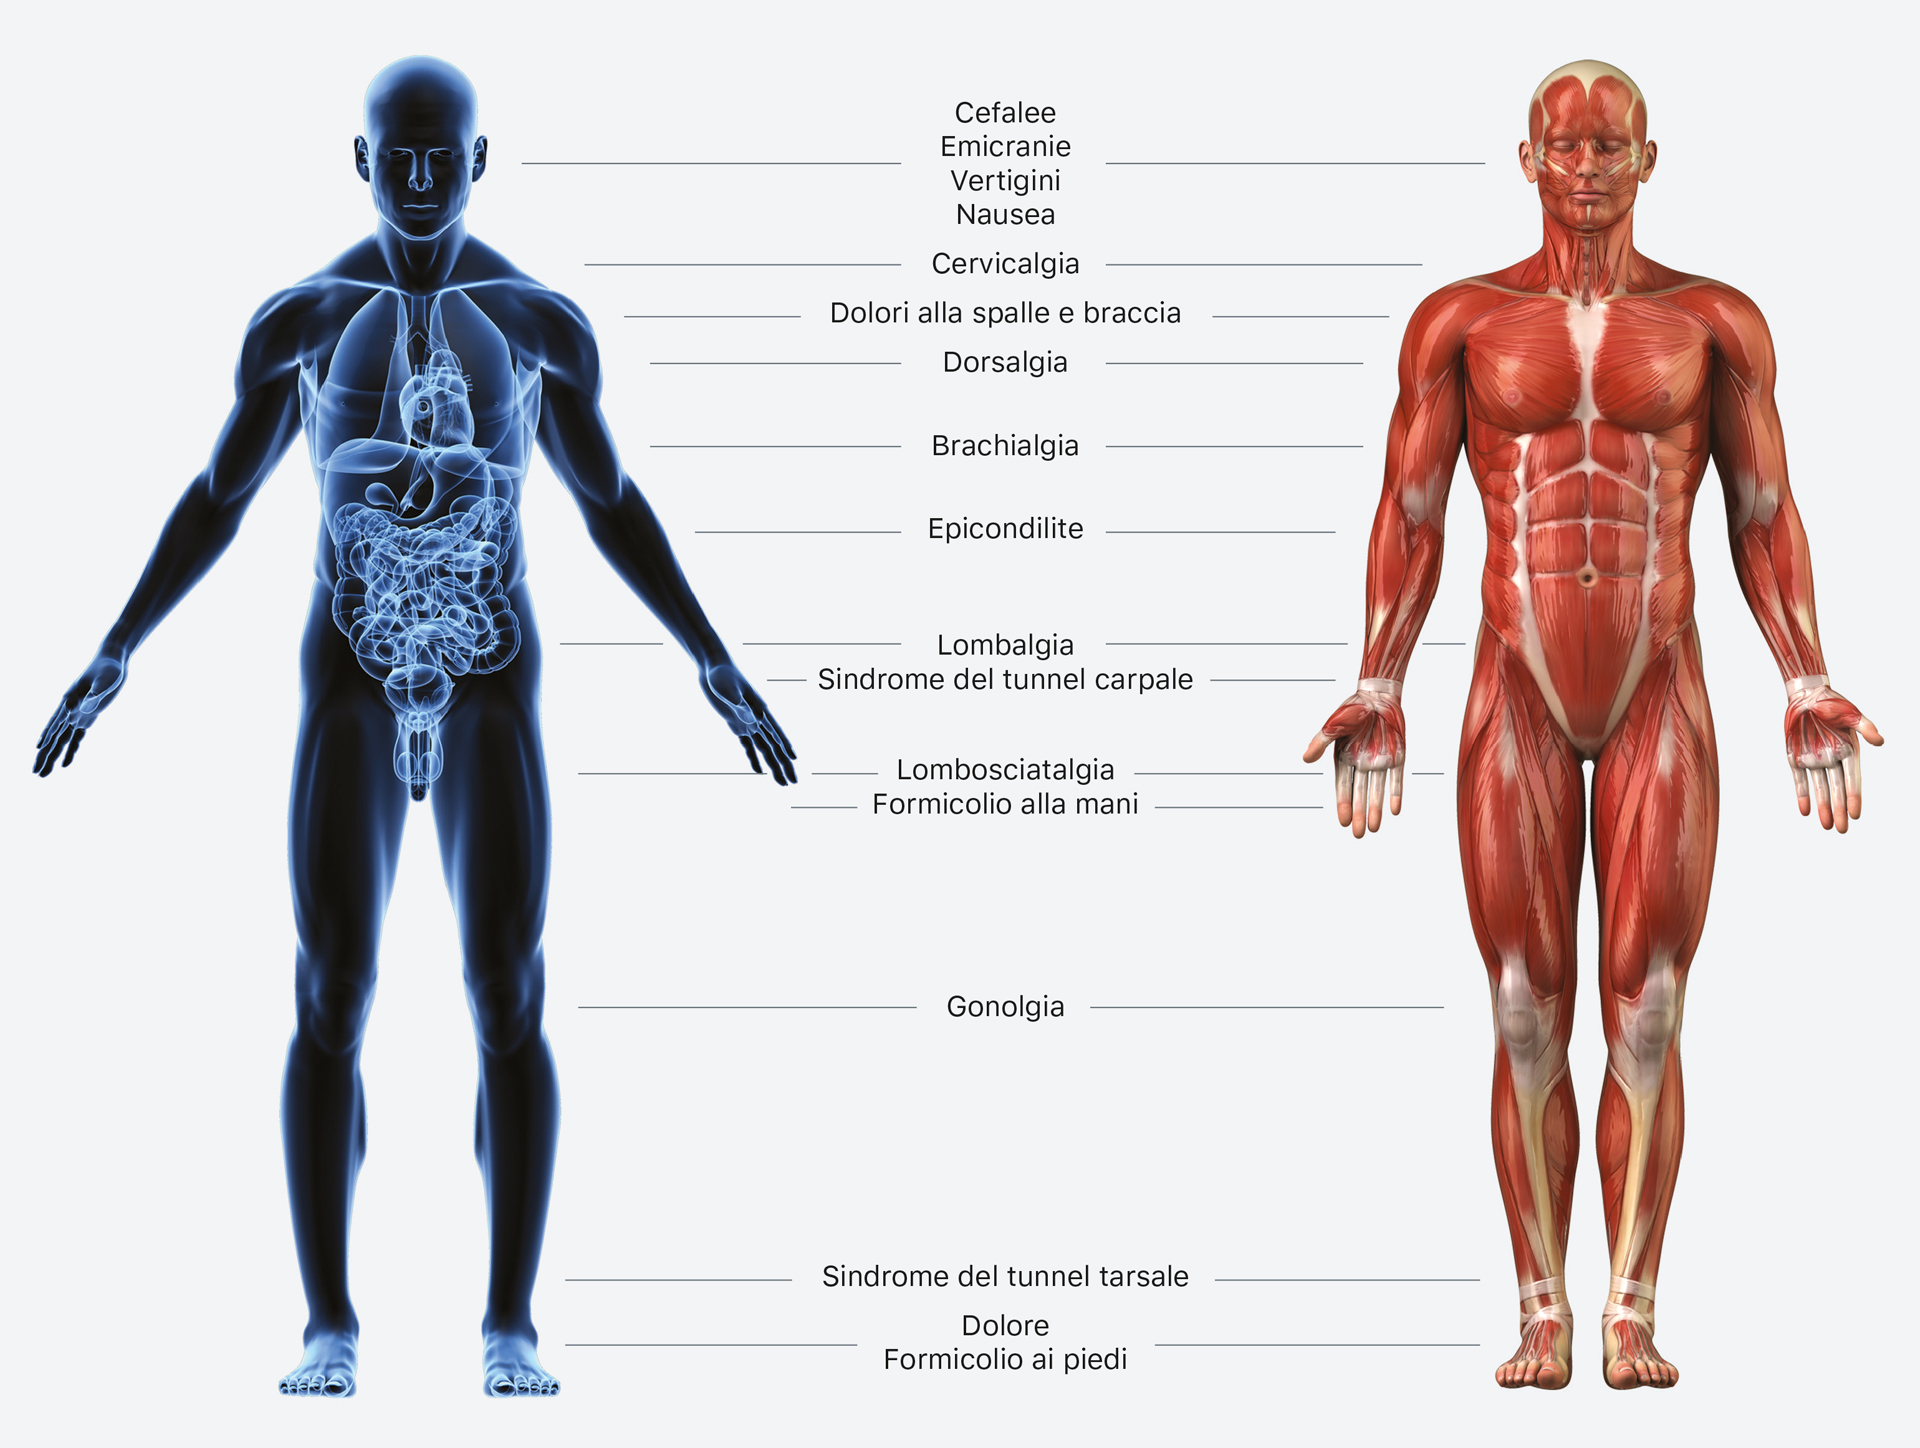 chiropratica infografica